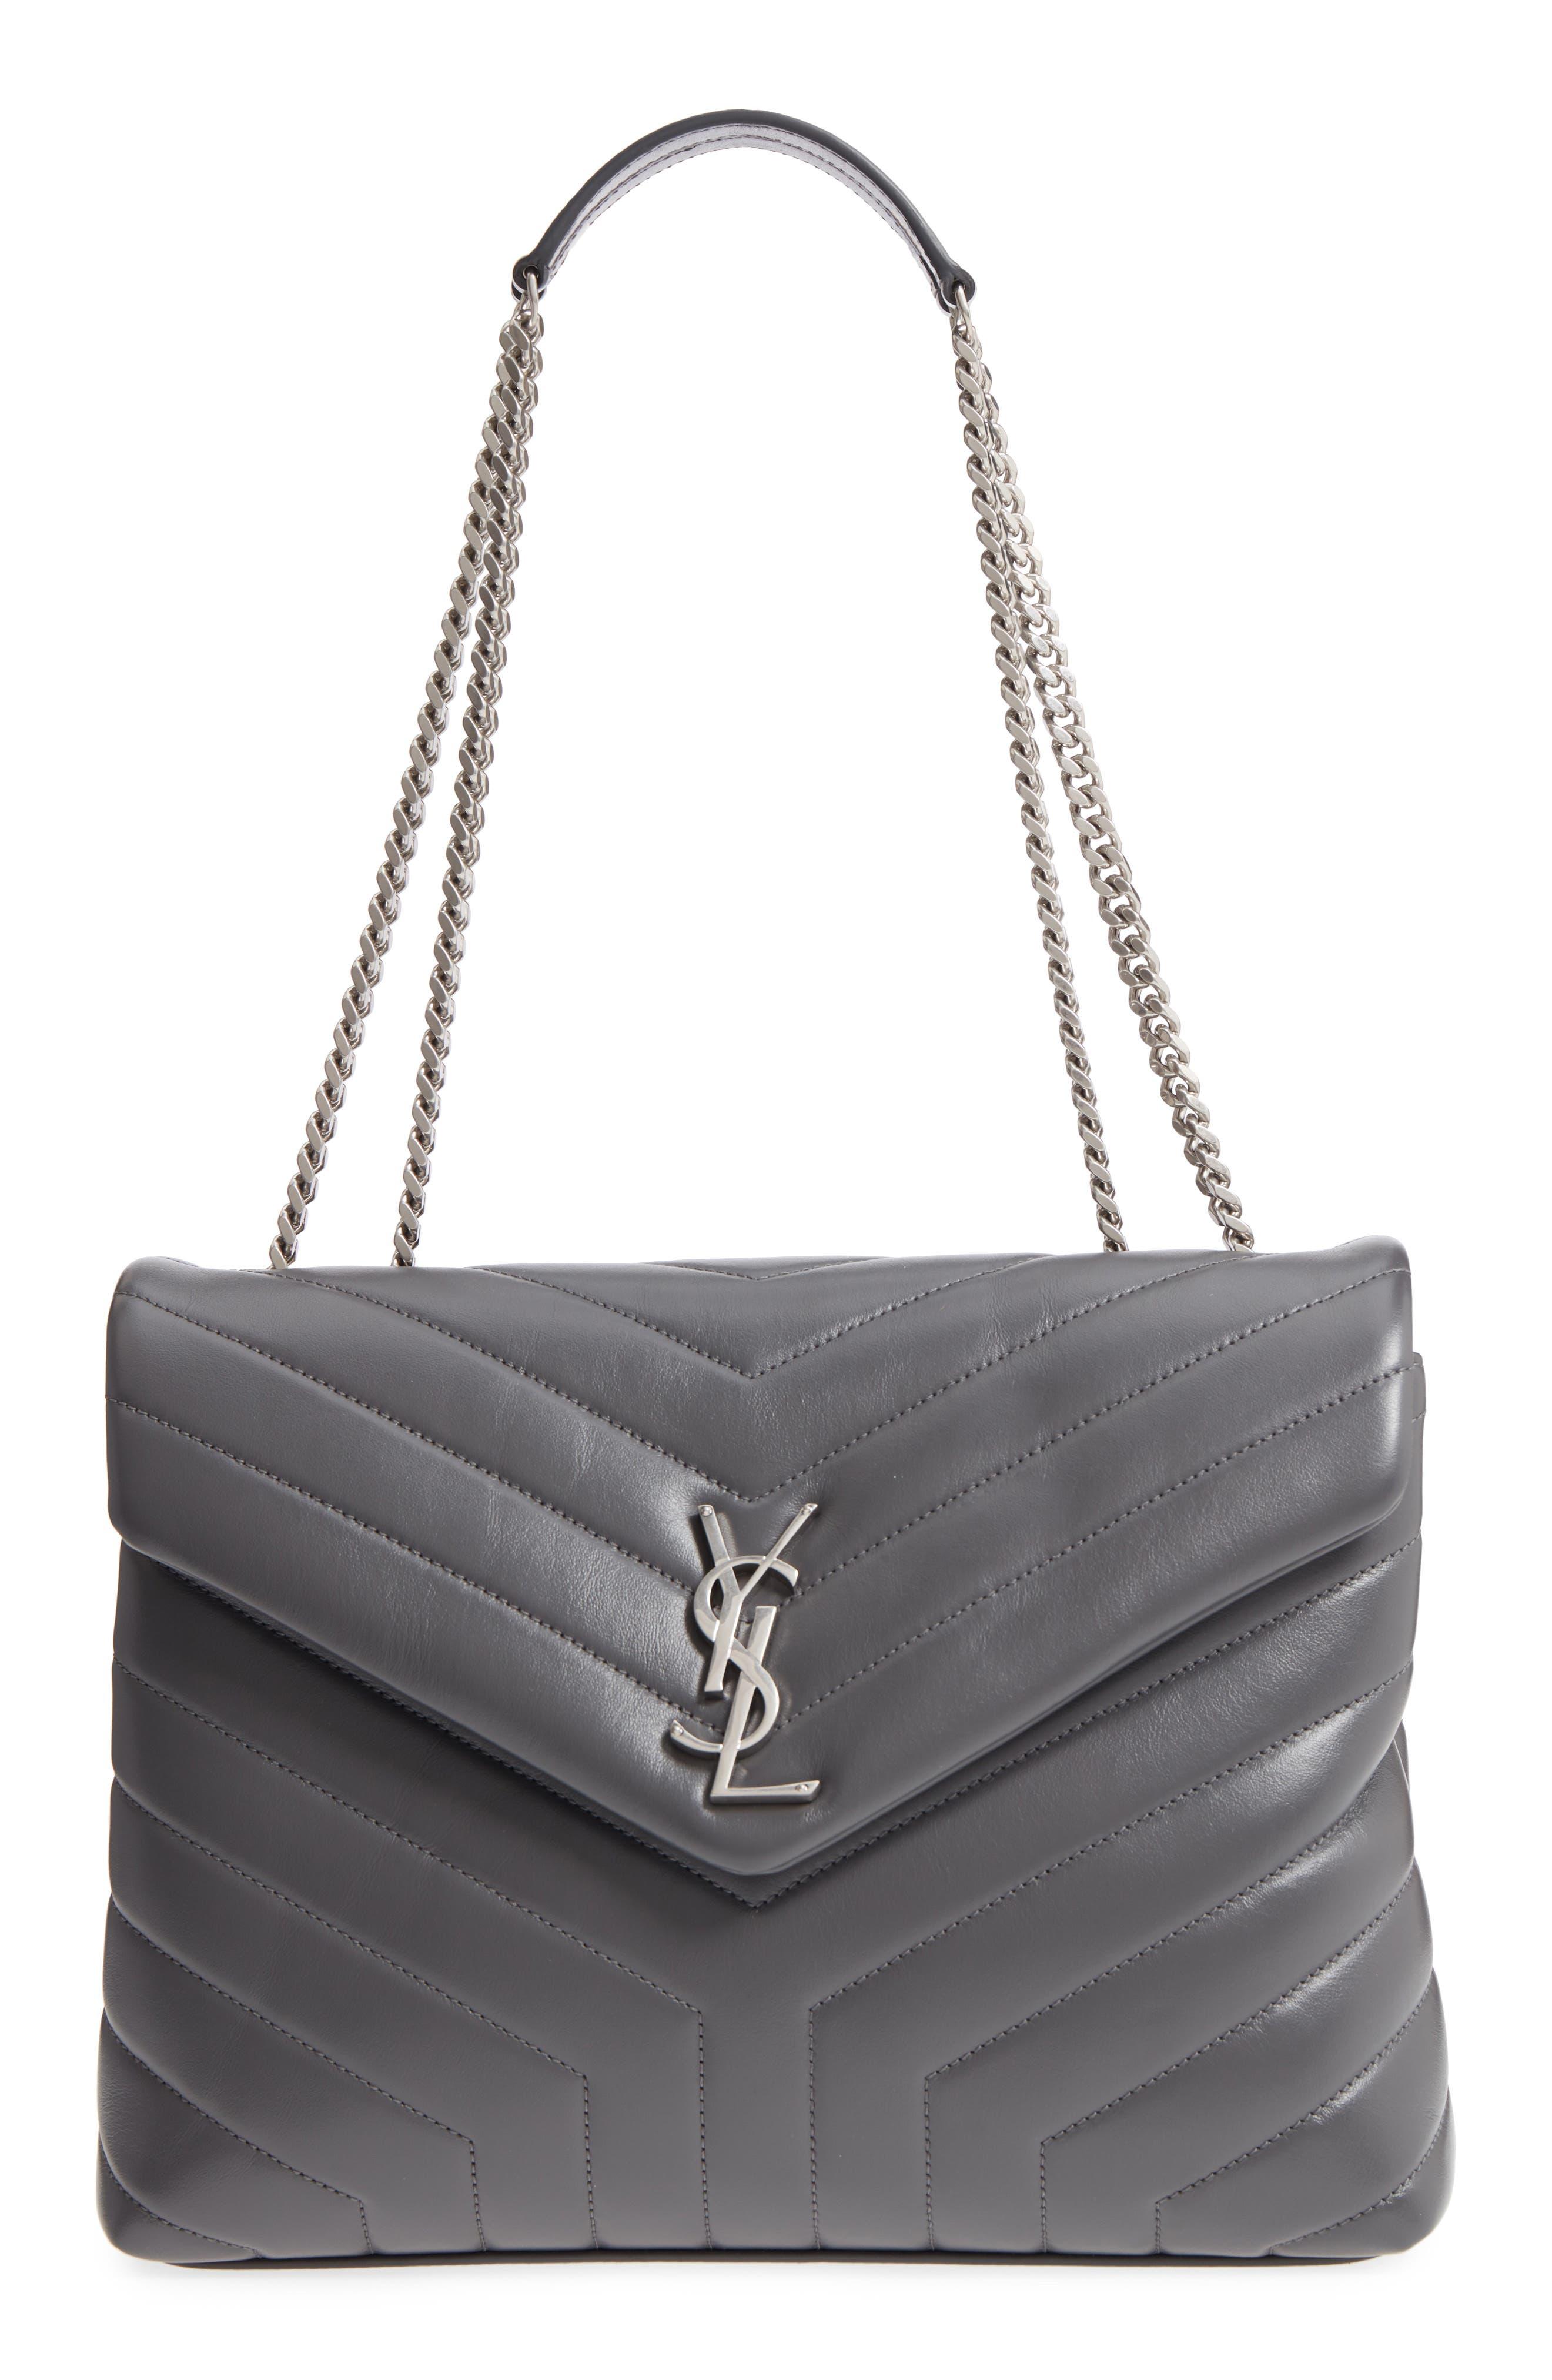 Medium Loulou Calfskin Leather Shoulder Bag,                         Main,                         color, STORM/ STORM